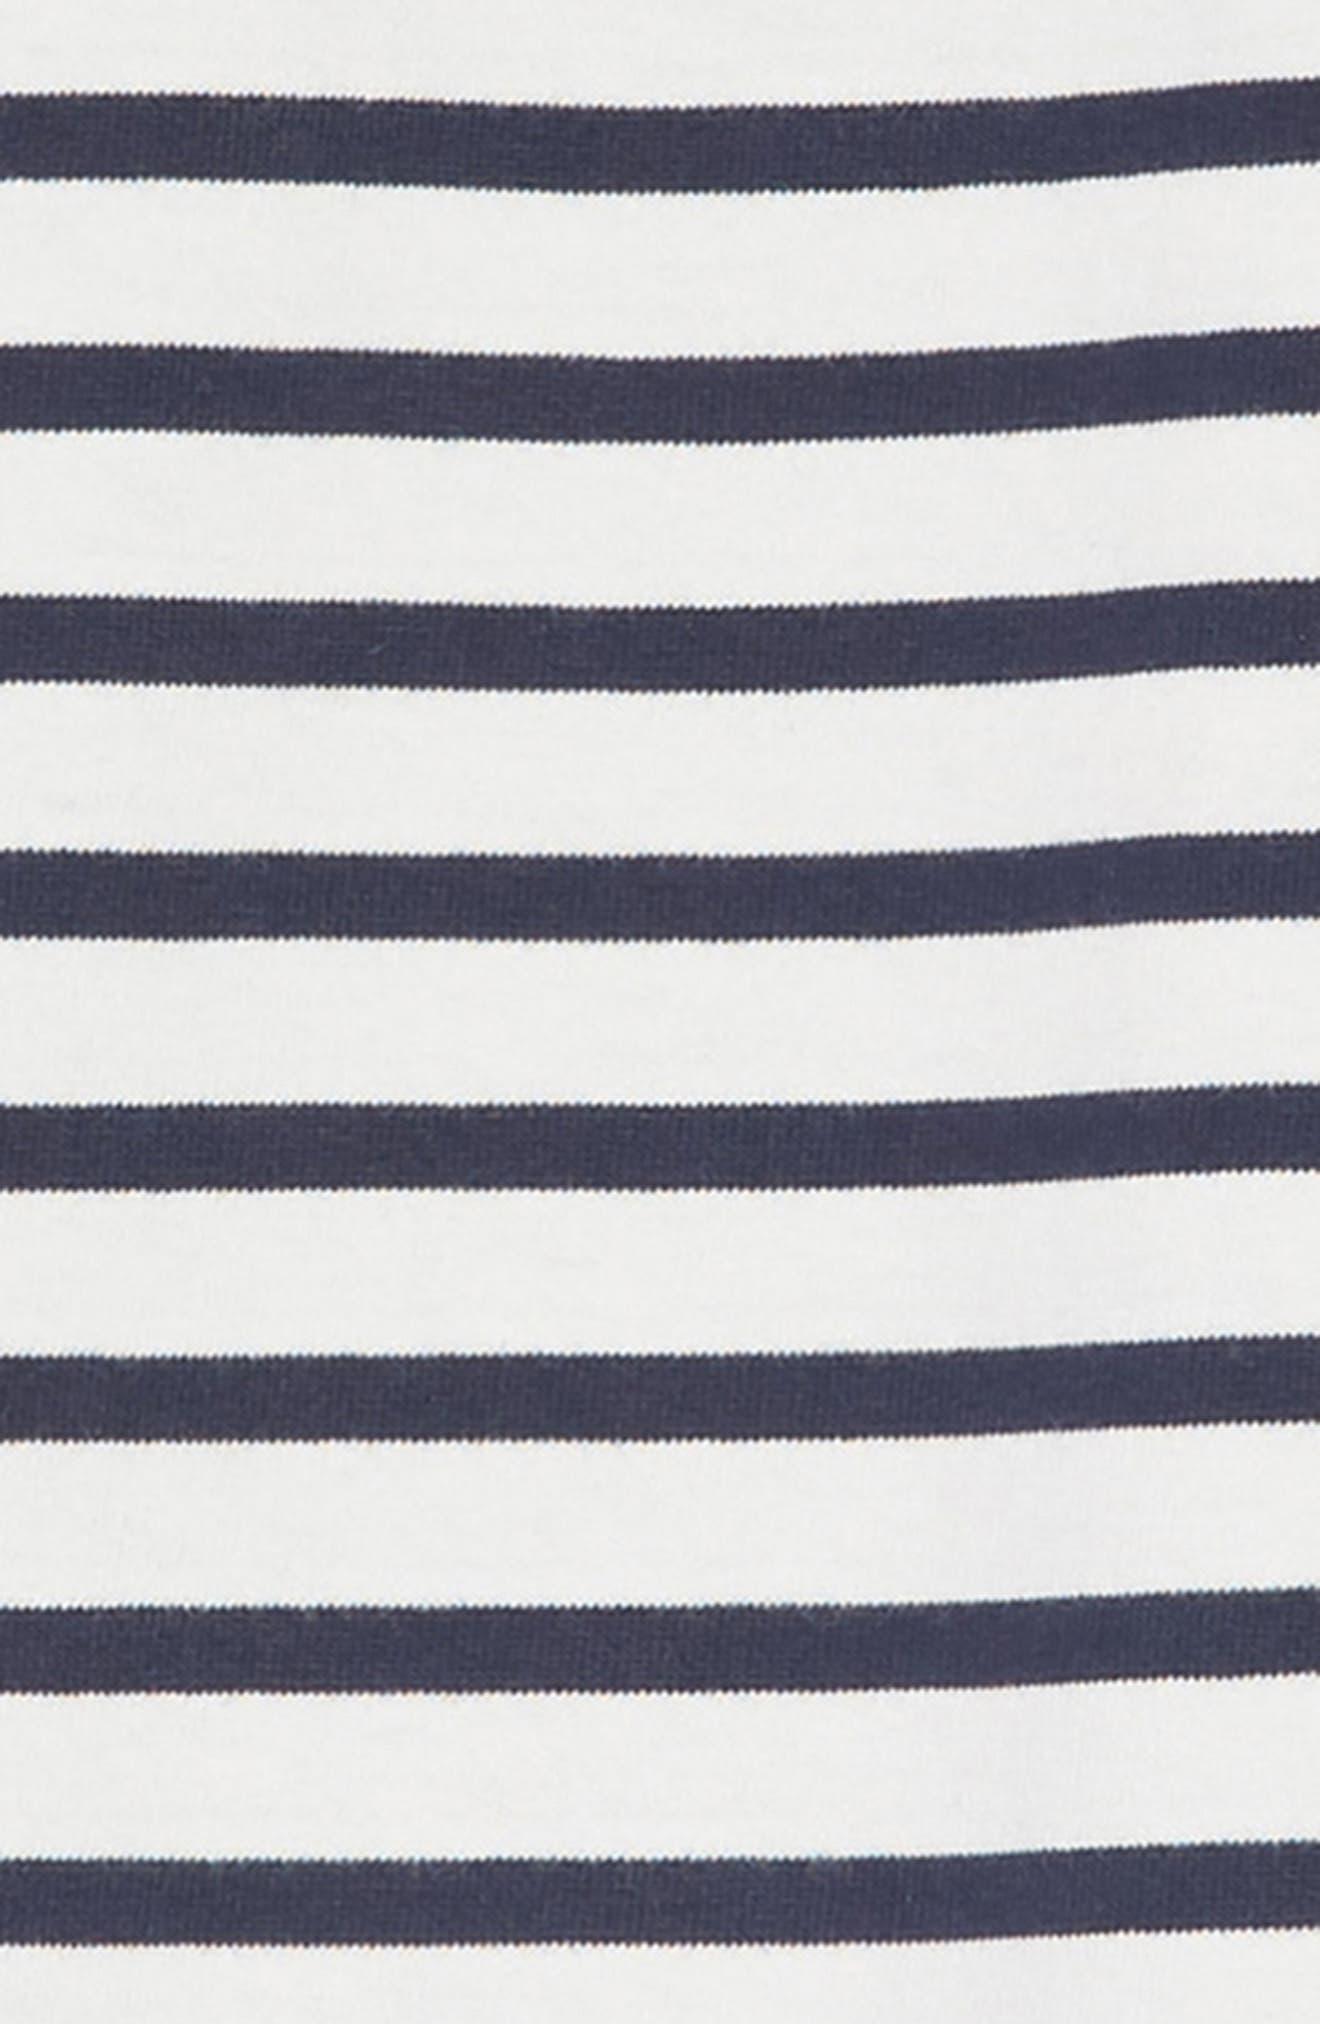 Drop Waist Dress,                             Alternate thumbnail 3, color,                             NAVY AND WHITE STRIPE